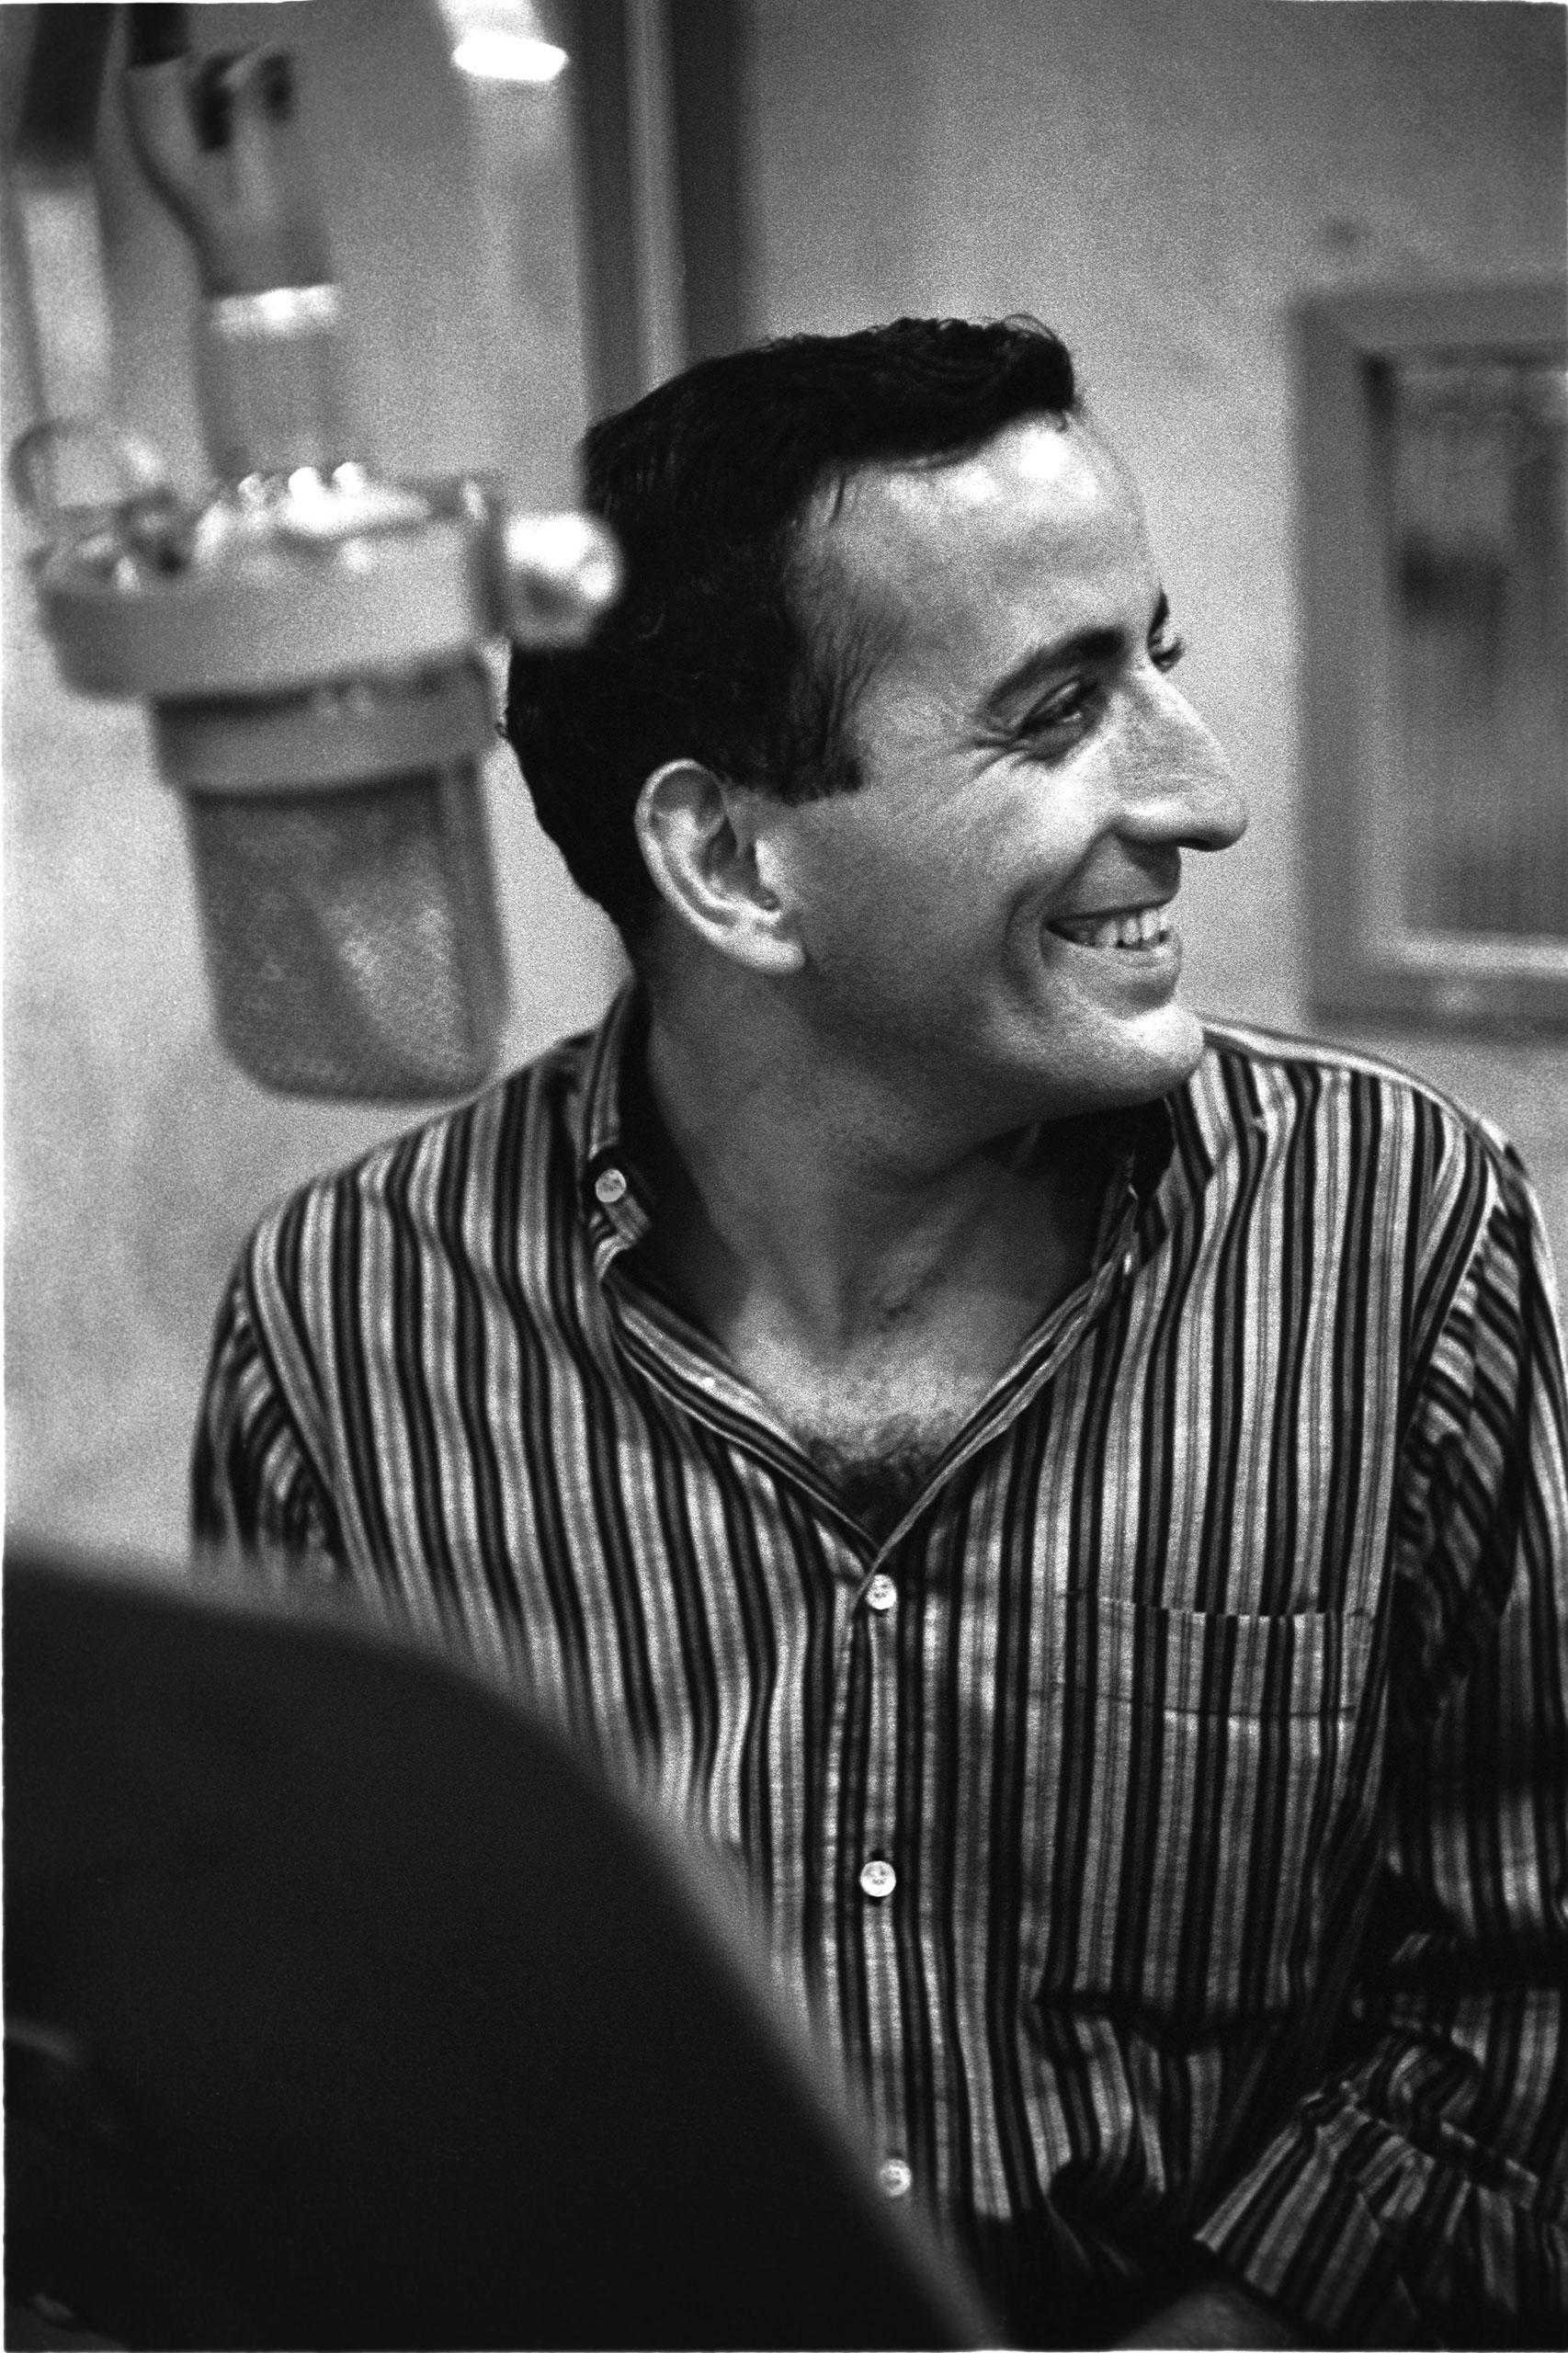 Tony Bennett in the recording studio, June 1957.